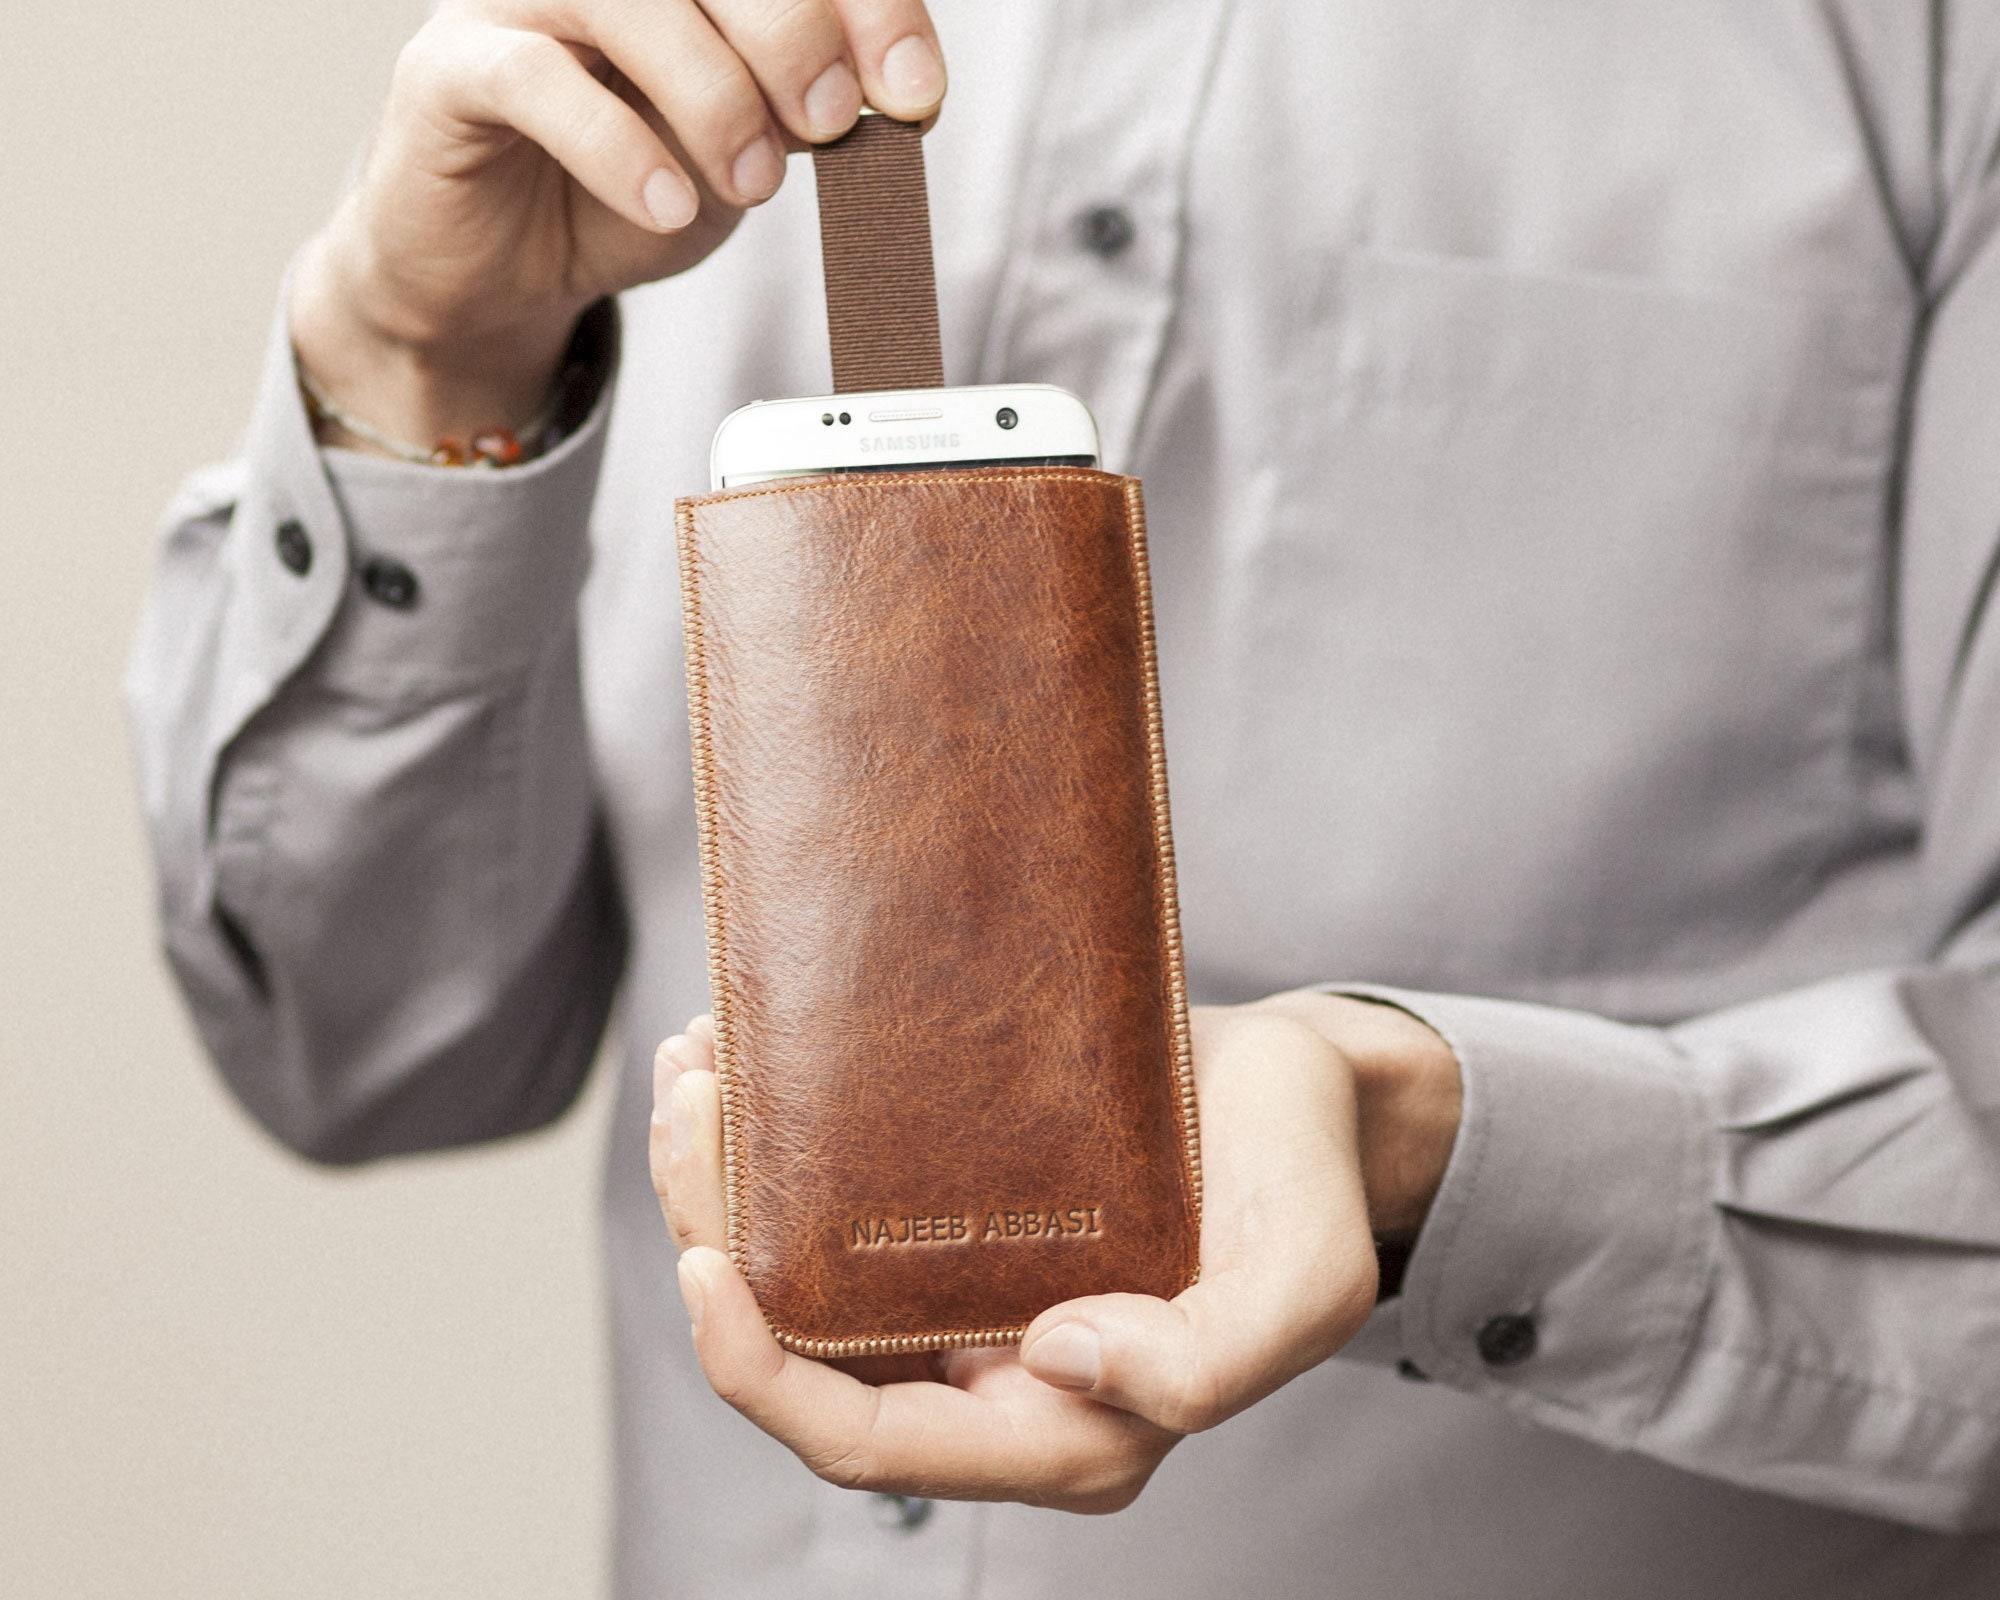 Desire 12 Plus U11 EYEs Handmade Sleeve for HTC Wildfire X U12 Life U12 Personalized Brown Italian Leather Cover Sleeve Magnetic Flap